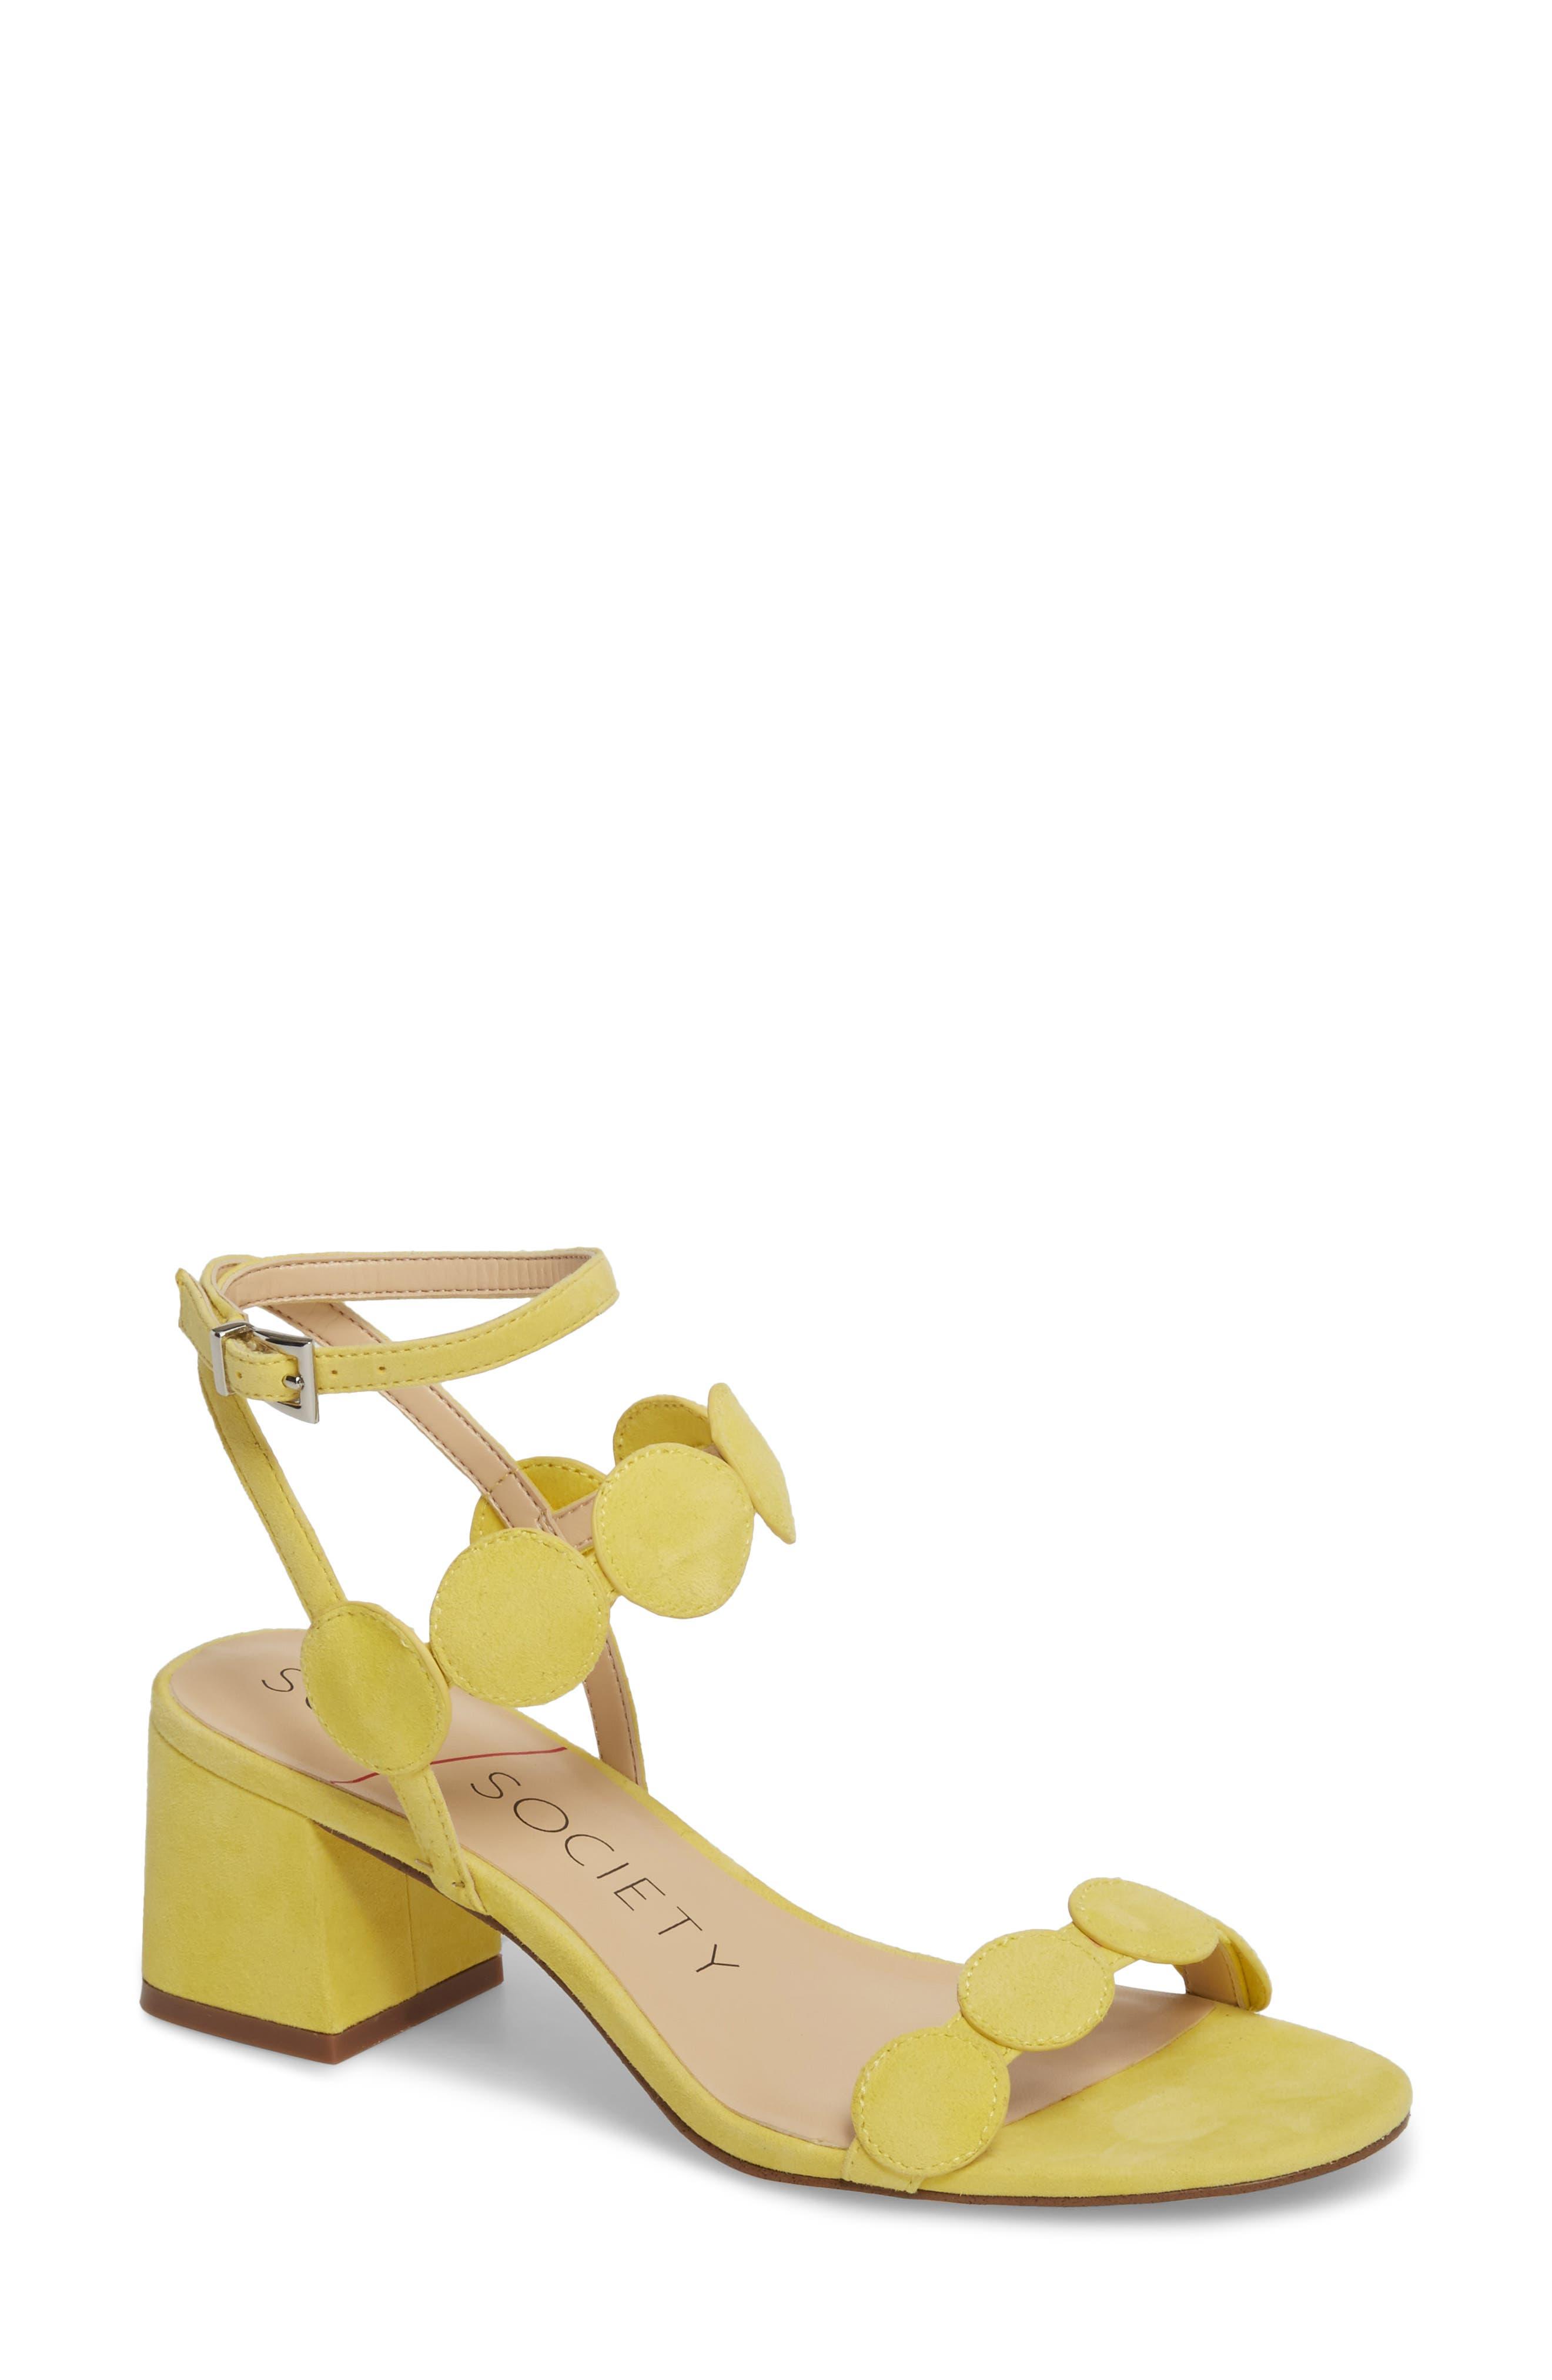 Main Image - Sole Society Shea Block Heel Sandal (Women)